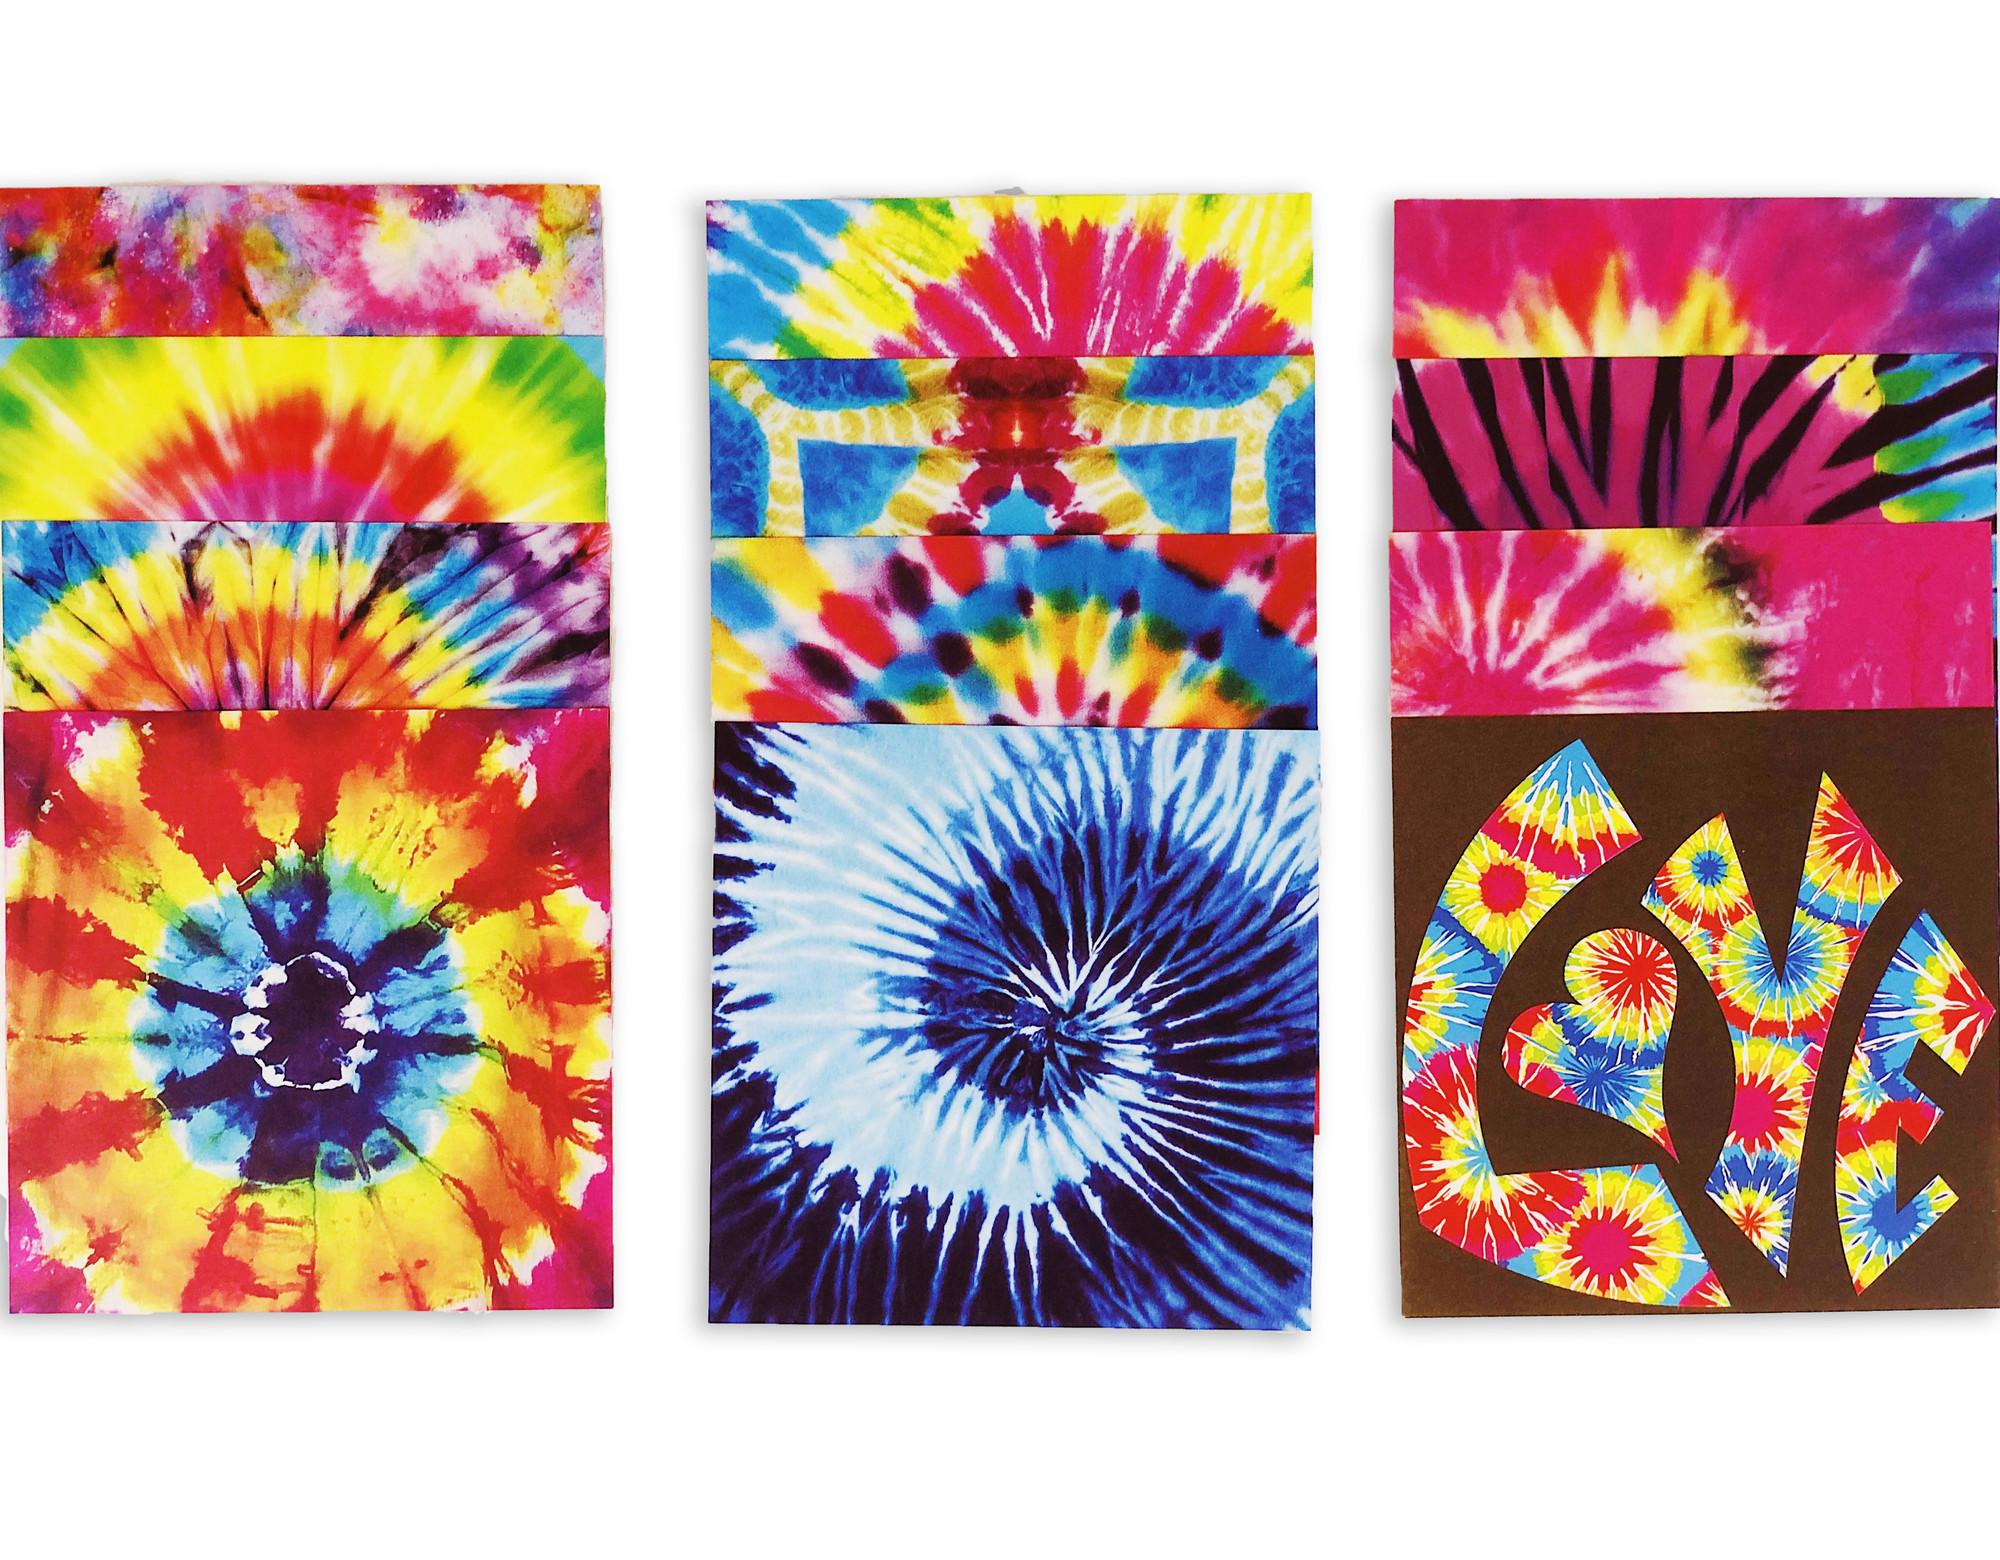 Origami Paper 300 Sheets Tie Dye Patterns 4 10 Cm Tuttle Publishing